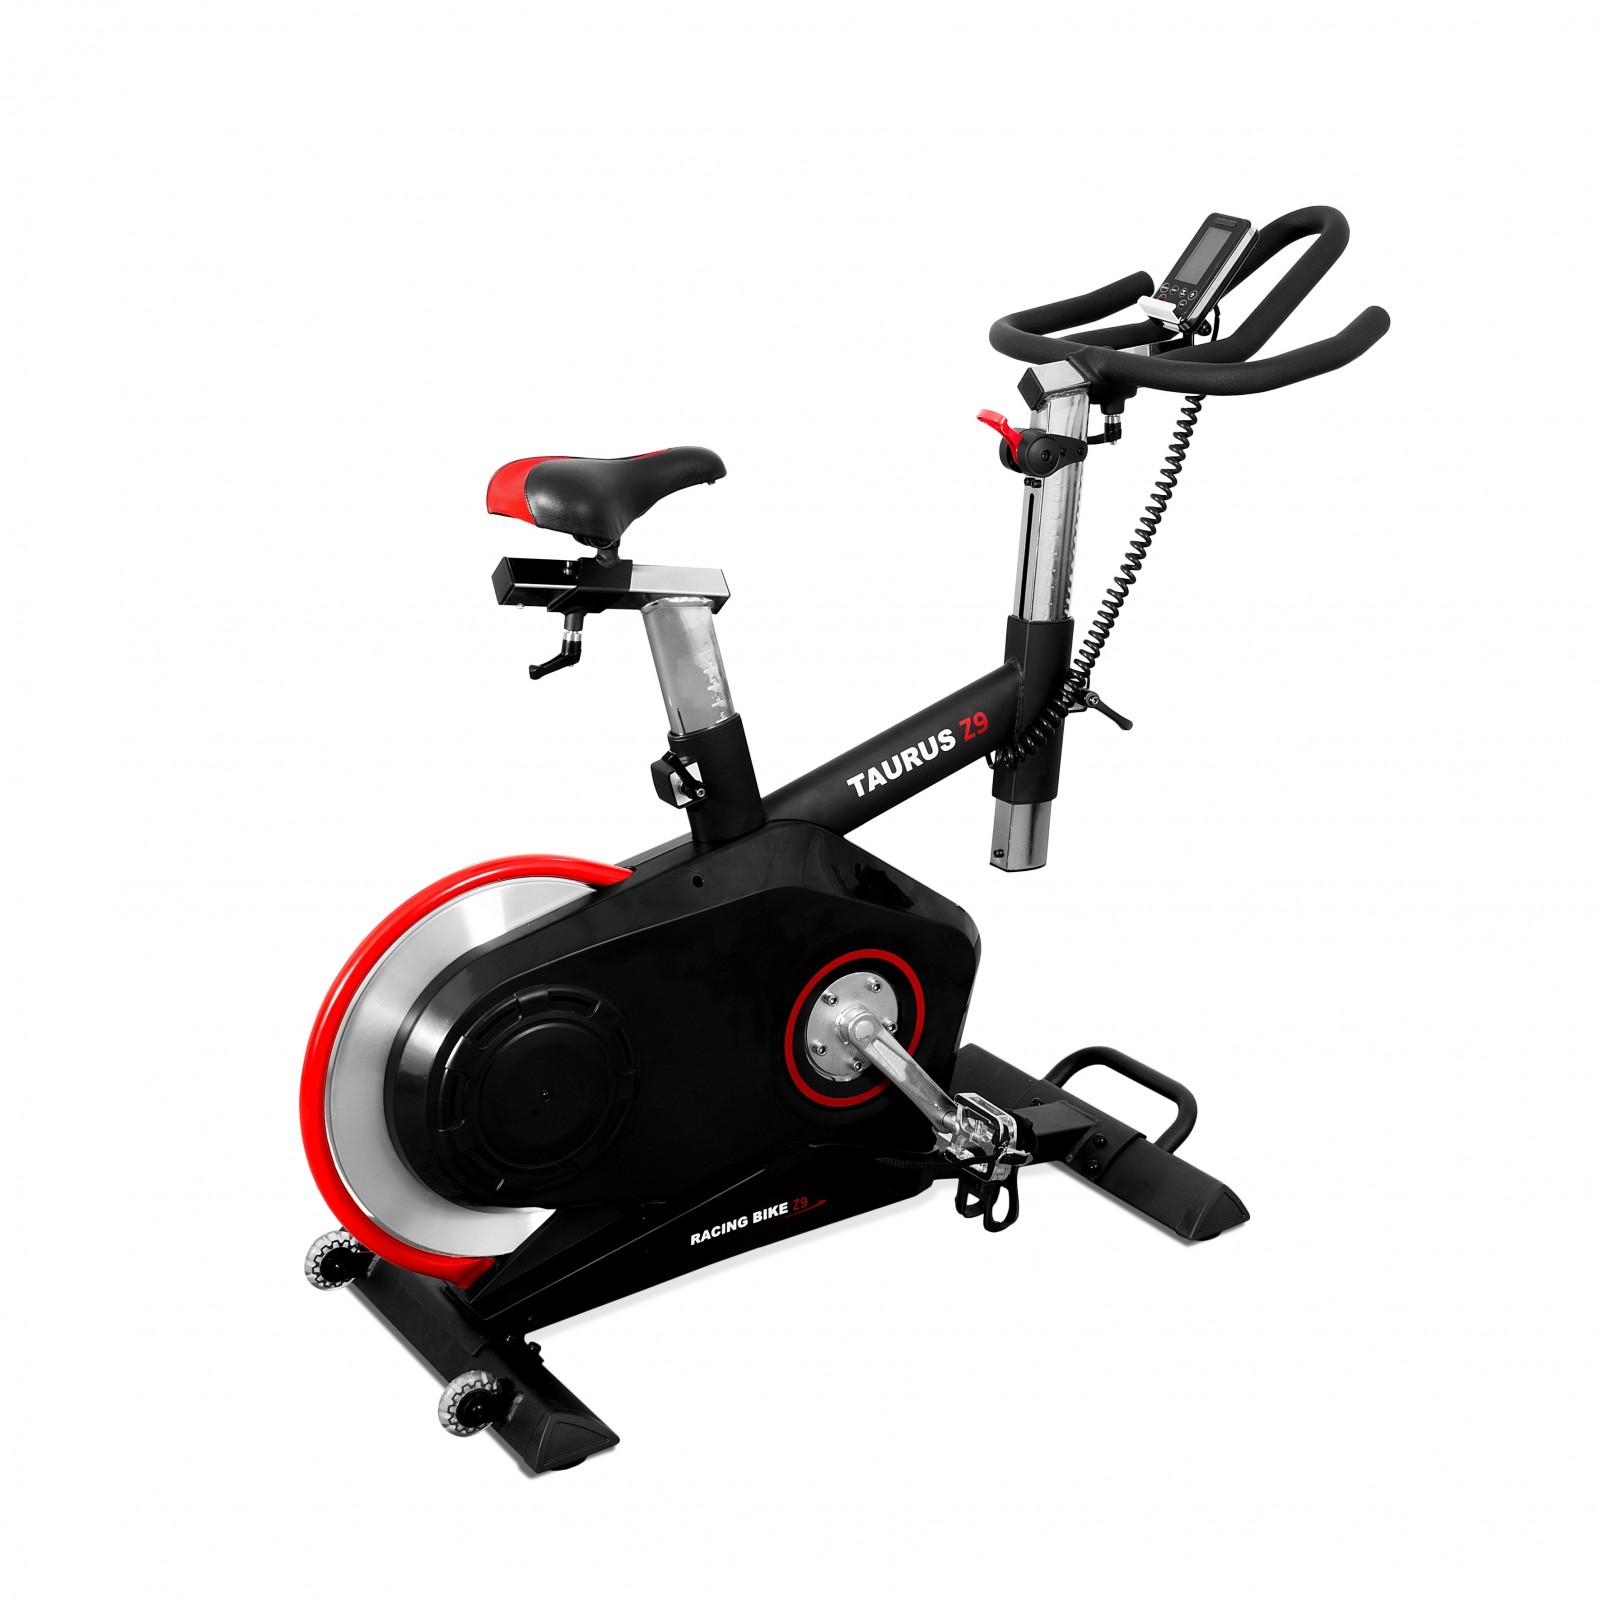 Taurus Indoor Bike Racing Bike Z9 Best Buy At Fitshop Nl